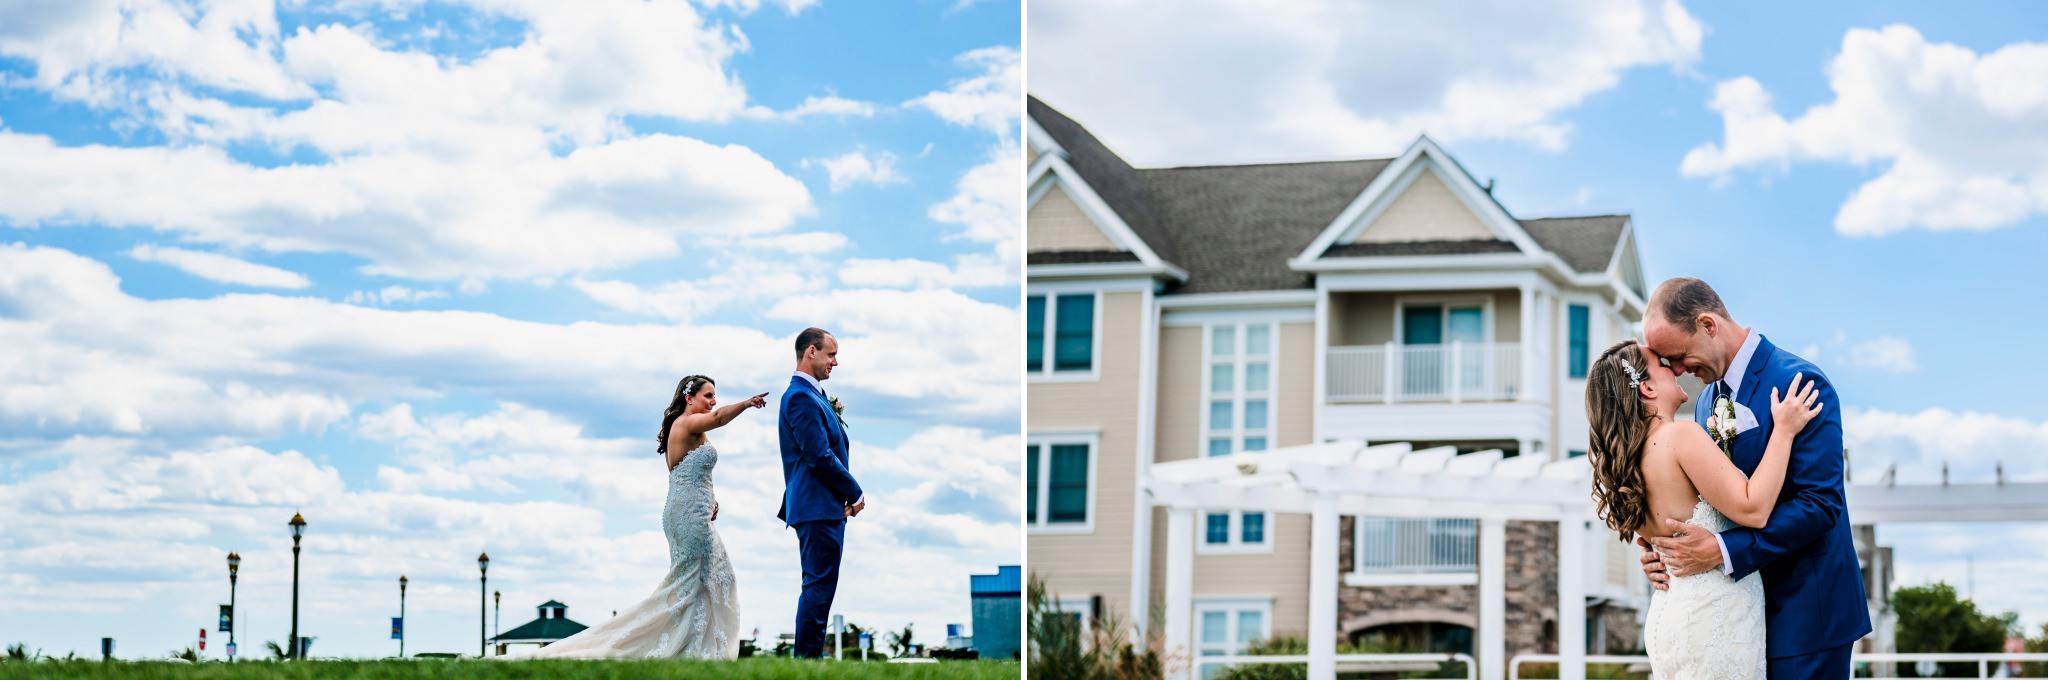 Culos-Sheraton-Eatontown-Long-Branch-Wedding-Photographer-45.JPG